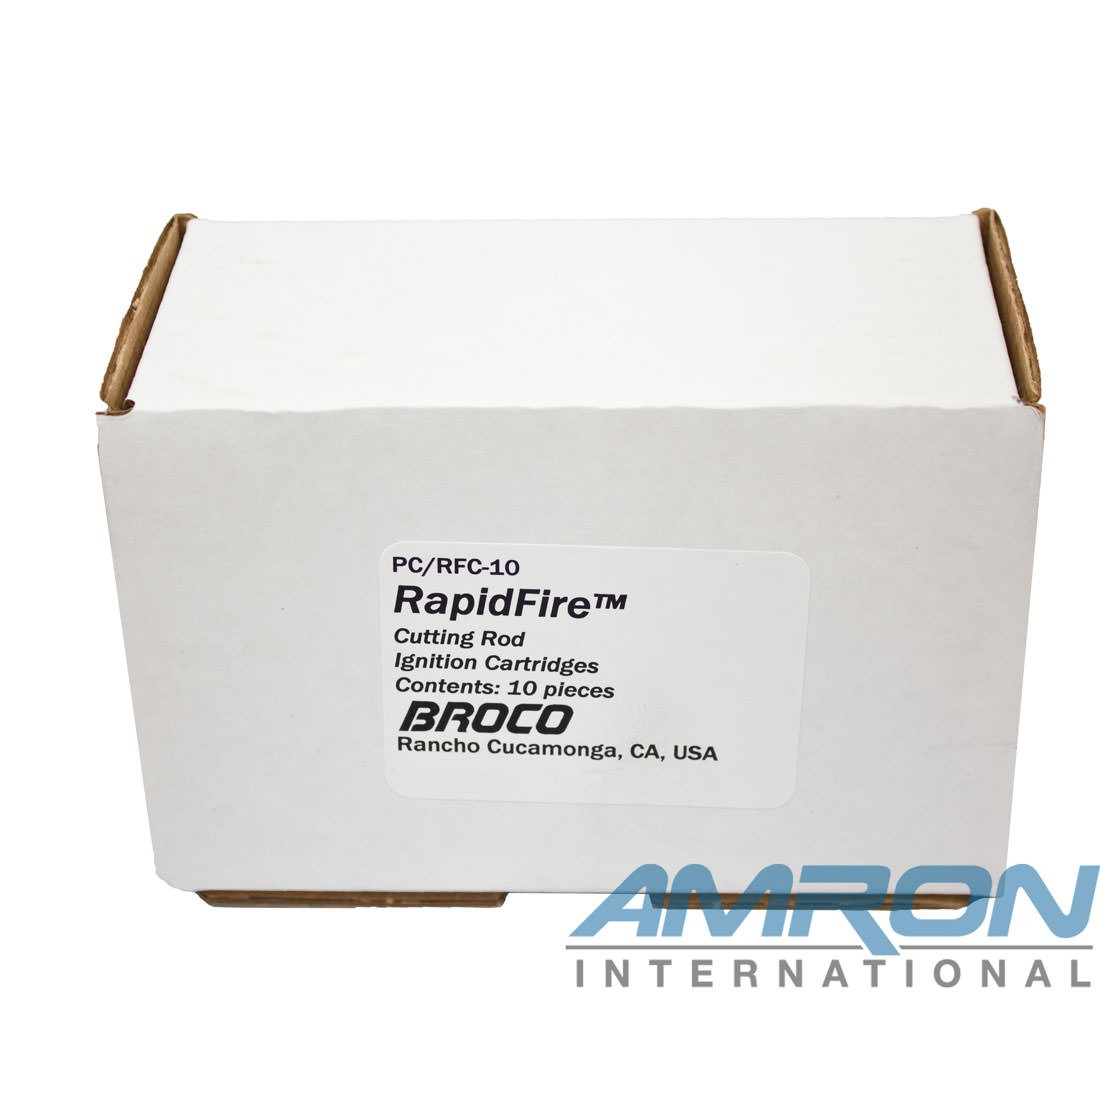 Broco RapidFire Cutting Rod Igniter - Box of 10 PC/RFC-10